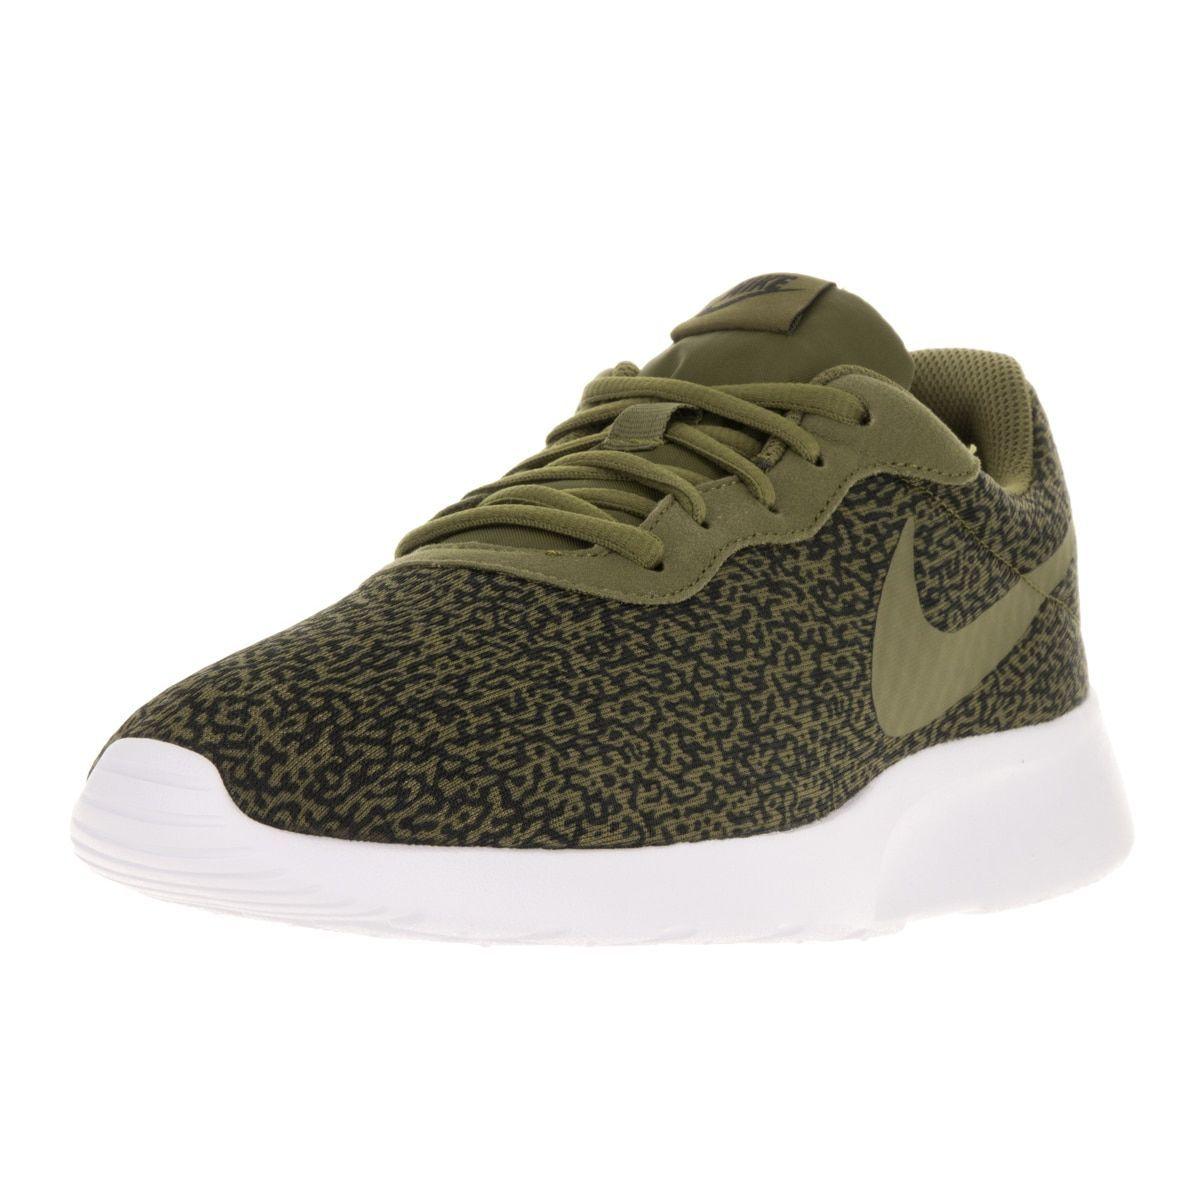 da3d1464f618 where can i buy nike mens tanjun print olive flak olv flak blk white running  shoe